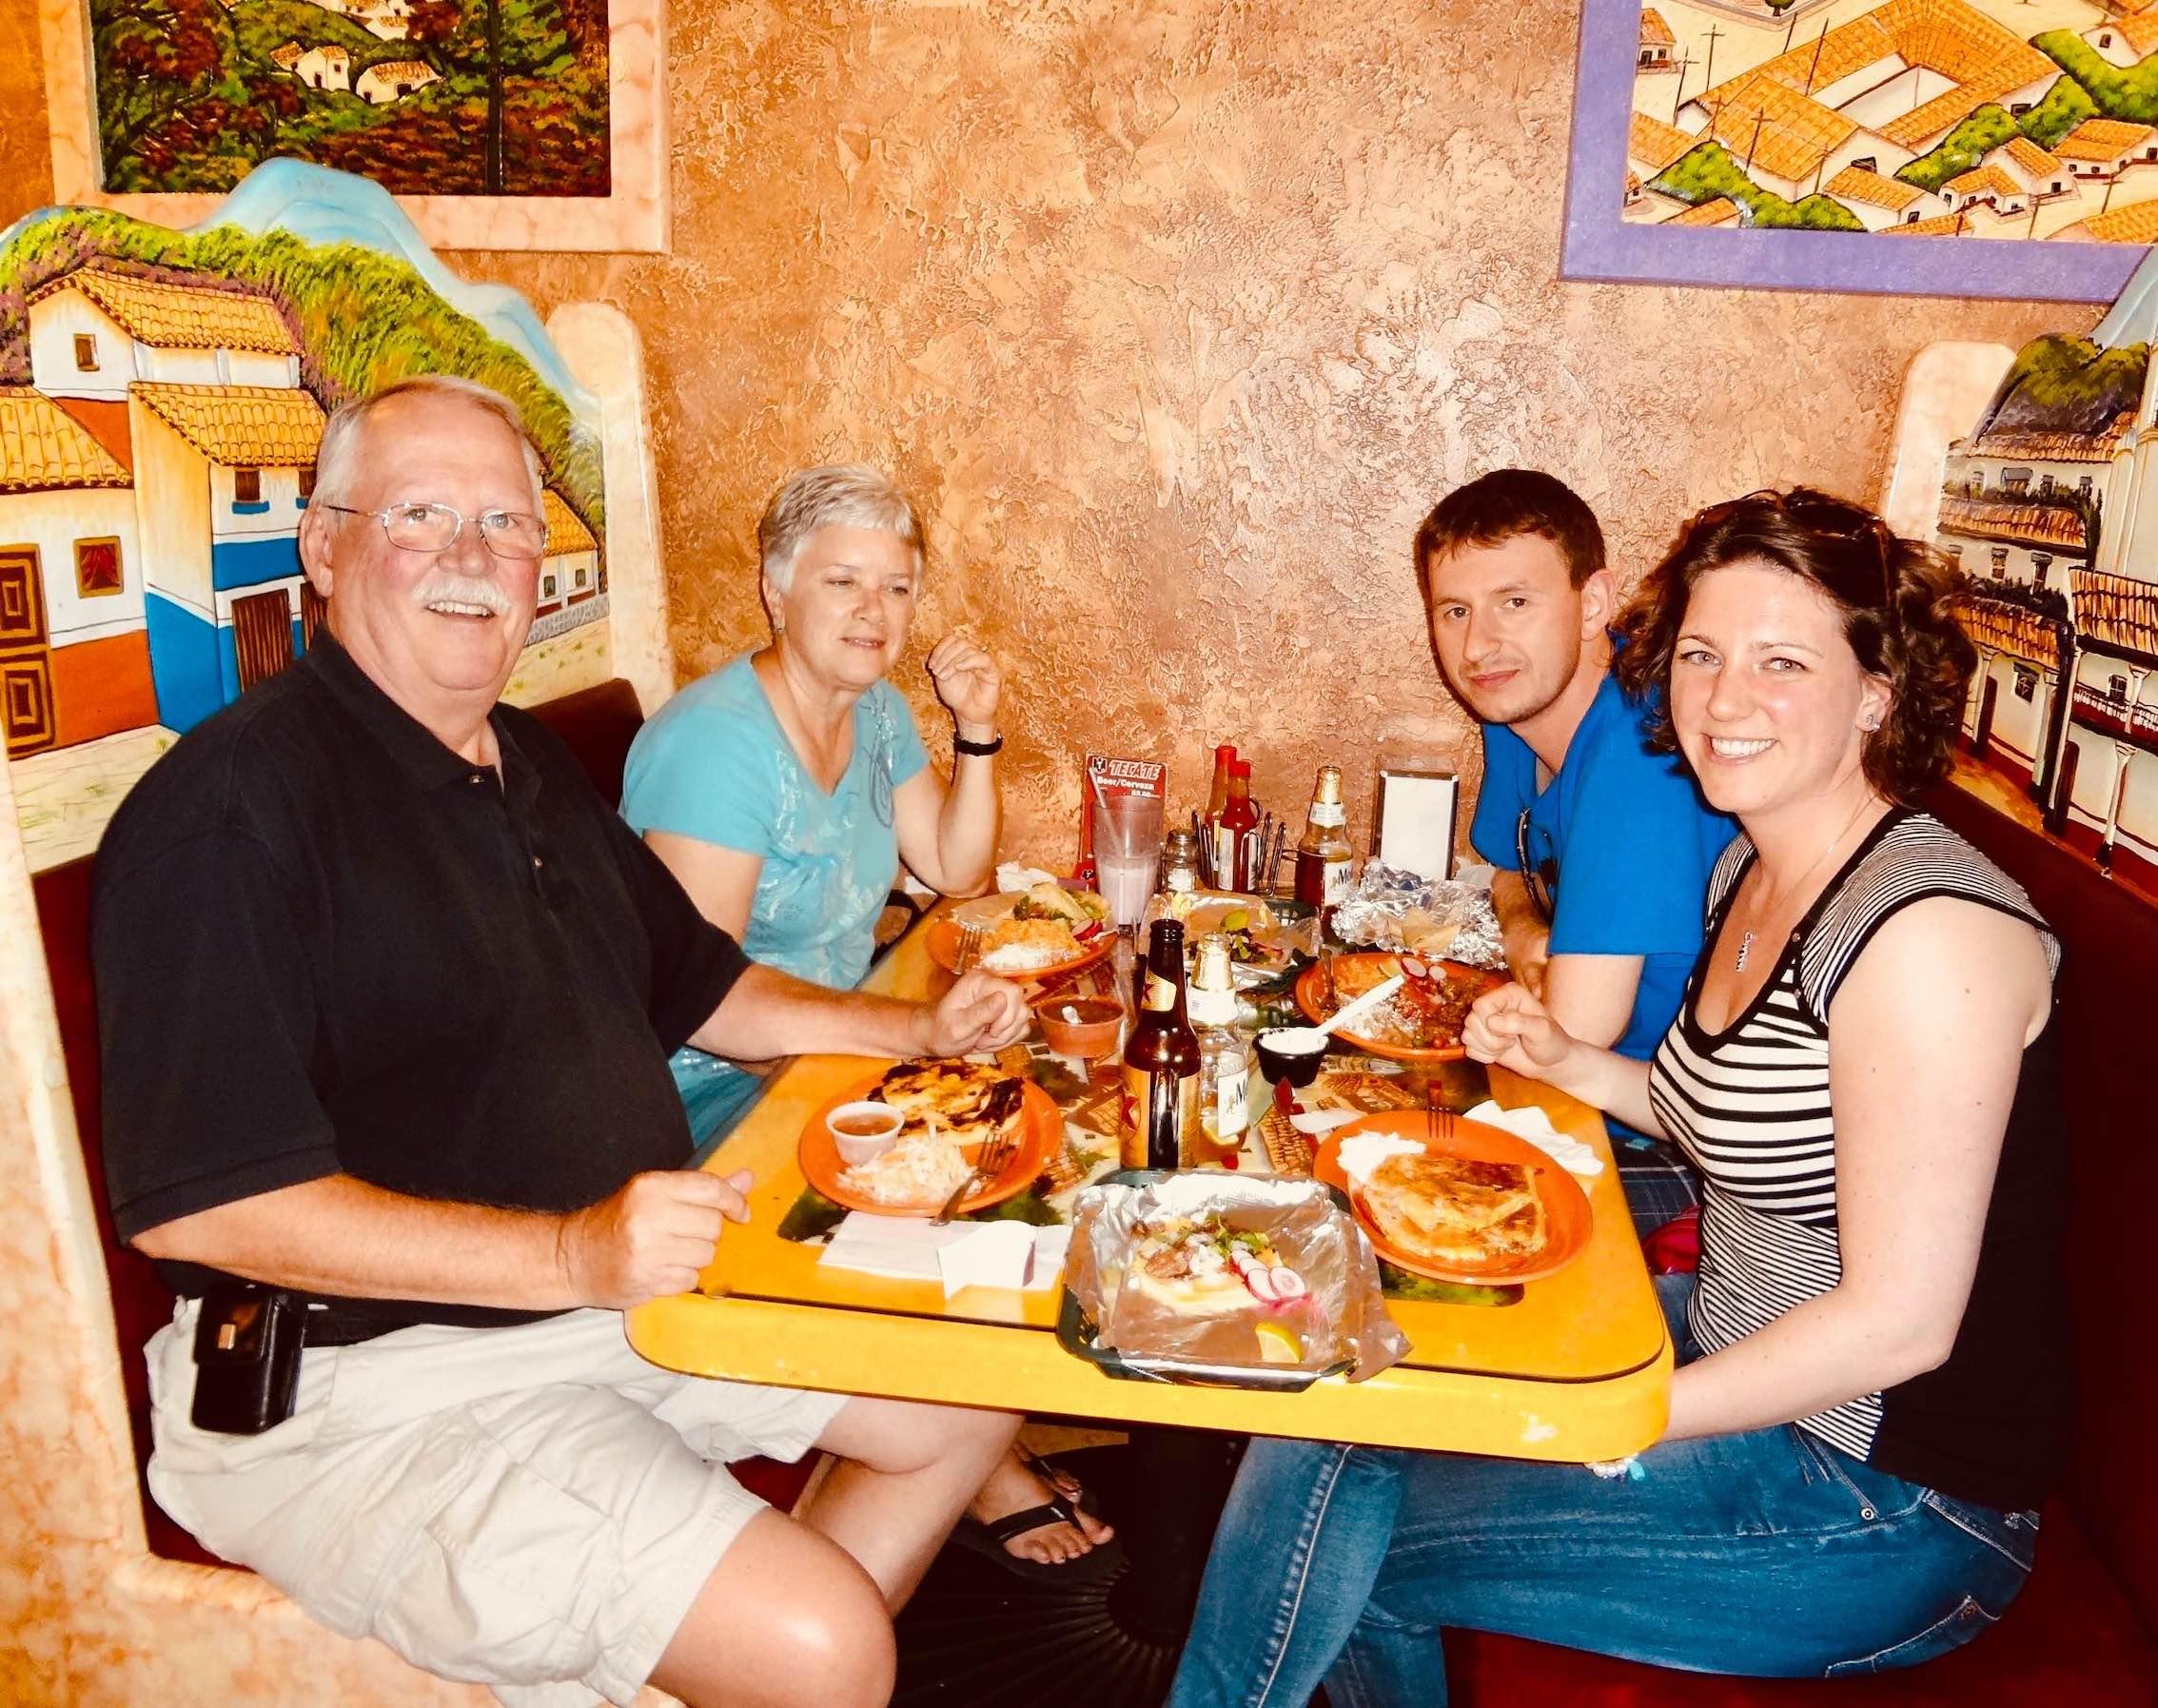 Dinner at Tacos Mariana's Restaurant Des Moines